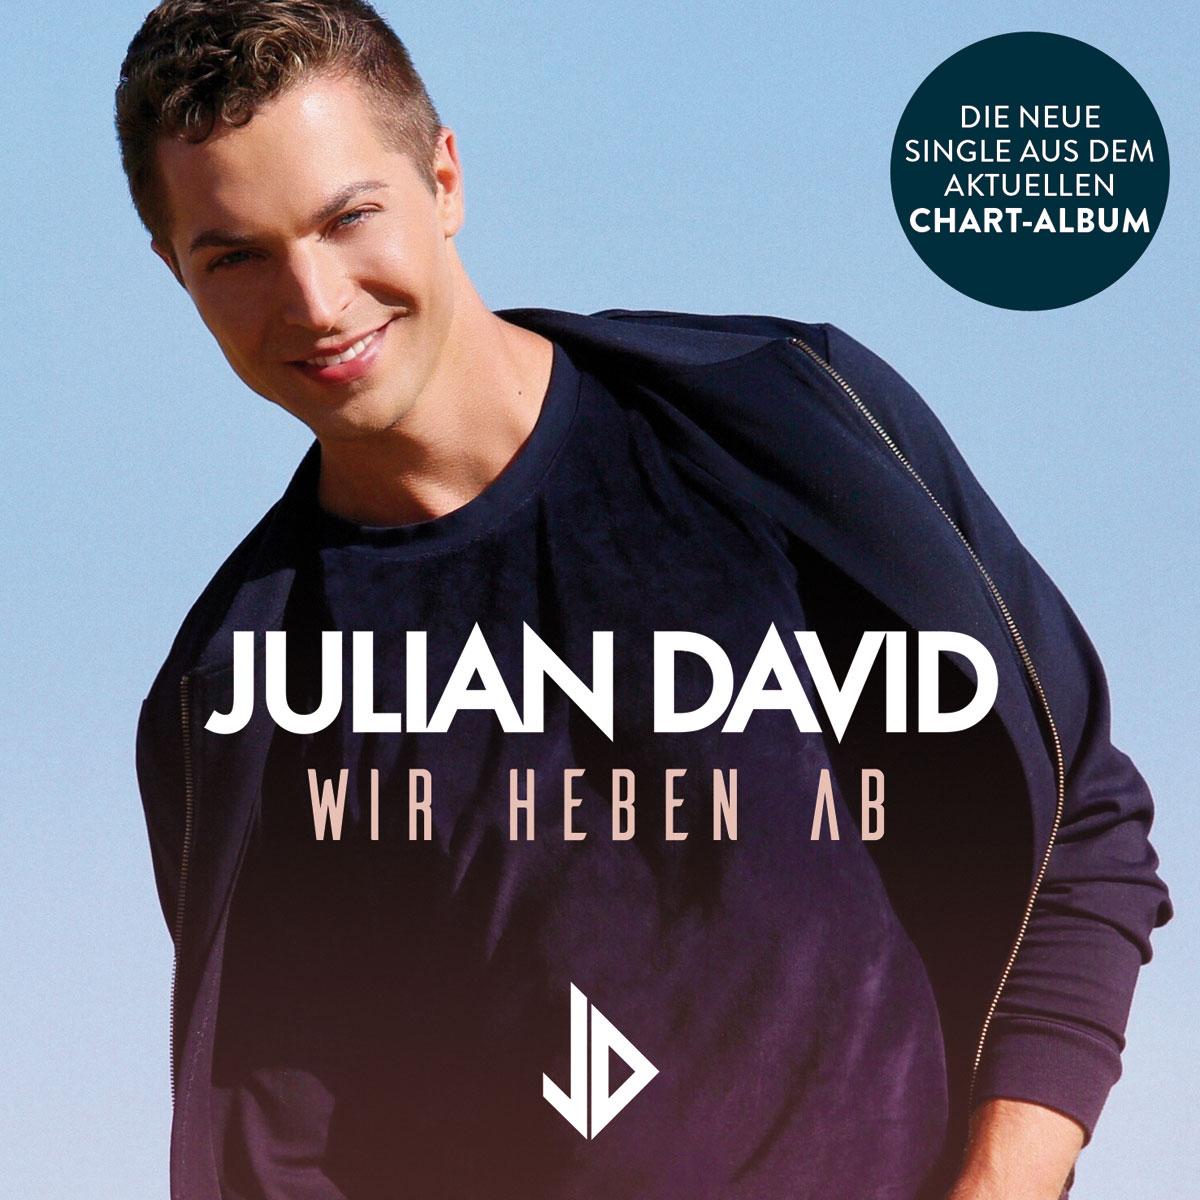 JULIAN DAVID – WIR HEBEN AB